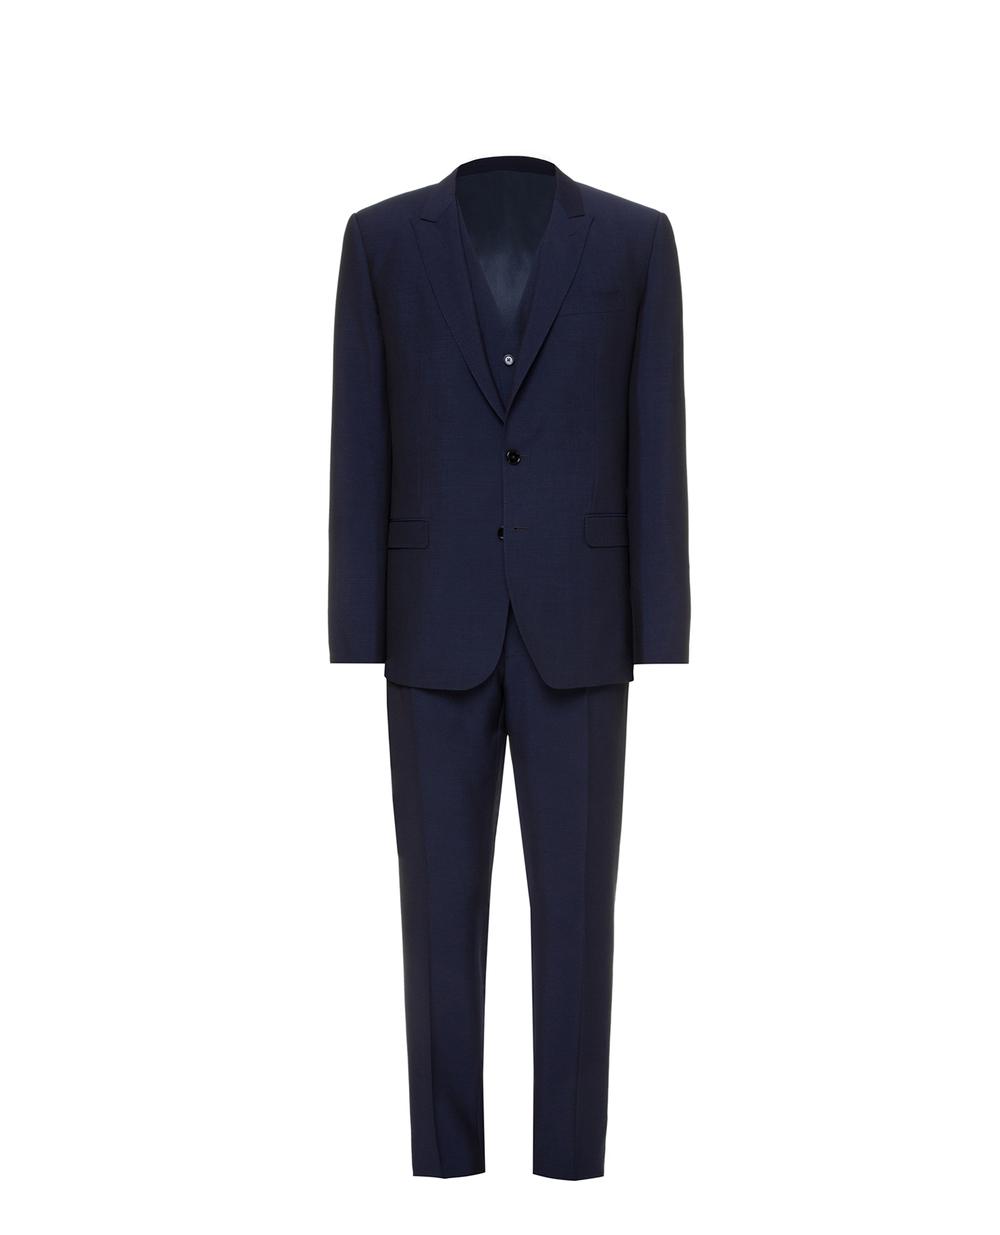 Шерстяной костюм Martini (пиджак, жилет, брюки) Dolce&Gabbana GK3XMT-FU3PU — Kameron